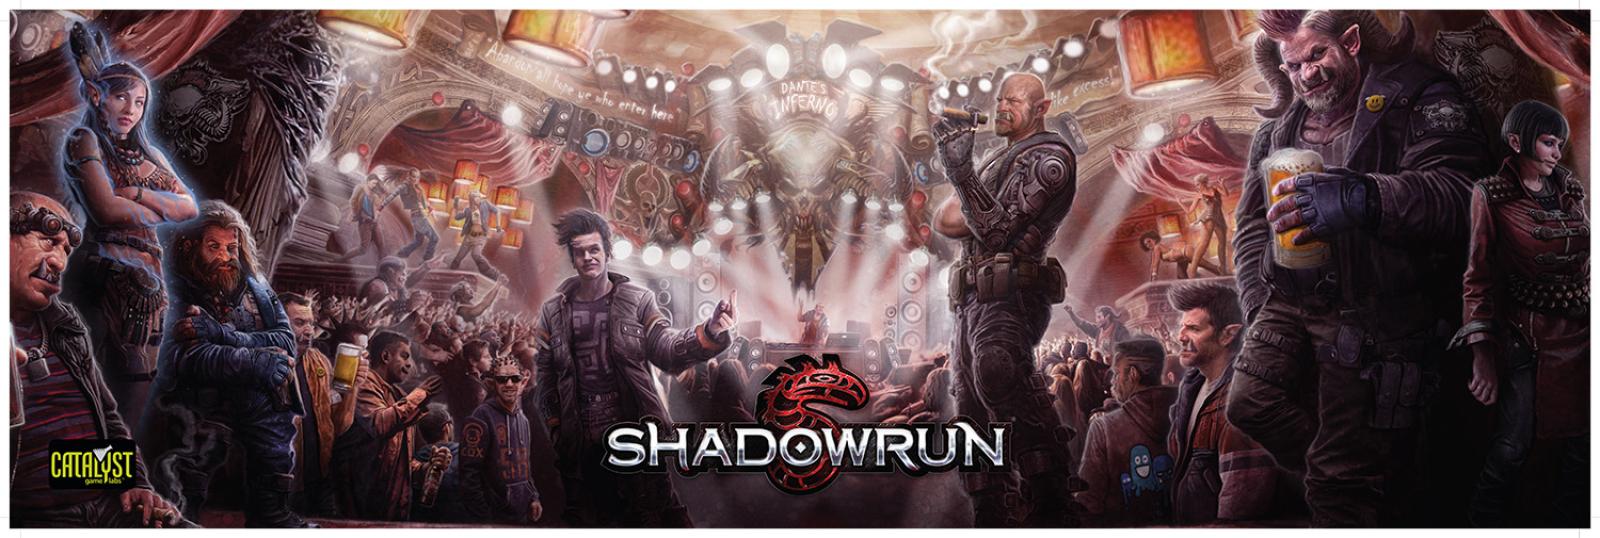 Shadowrun 2075 Homepage World Anvil